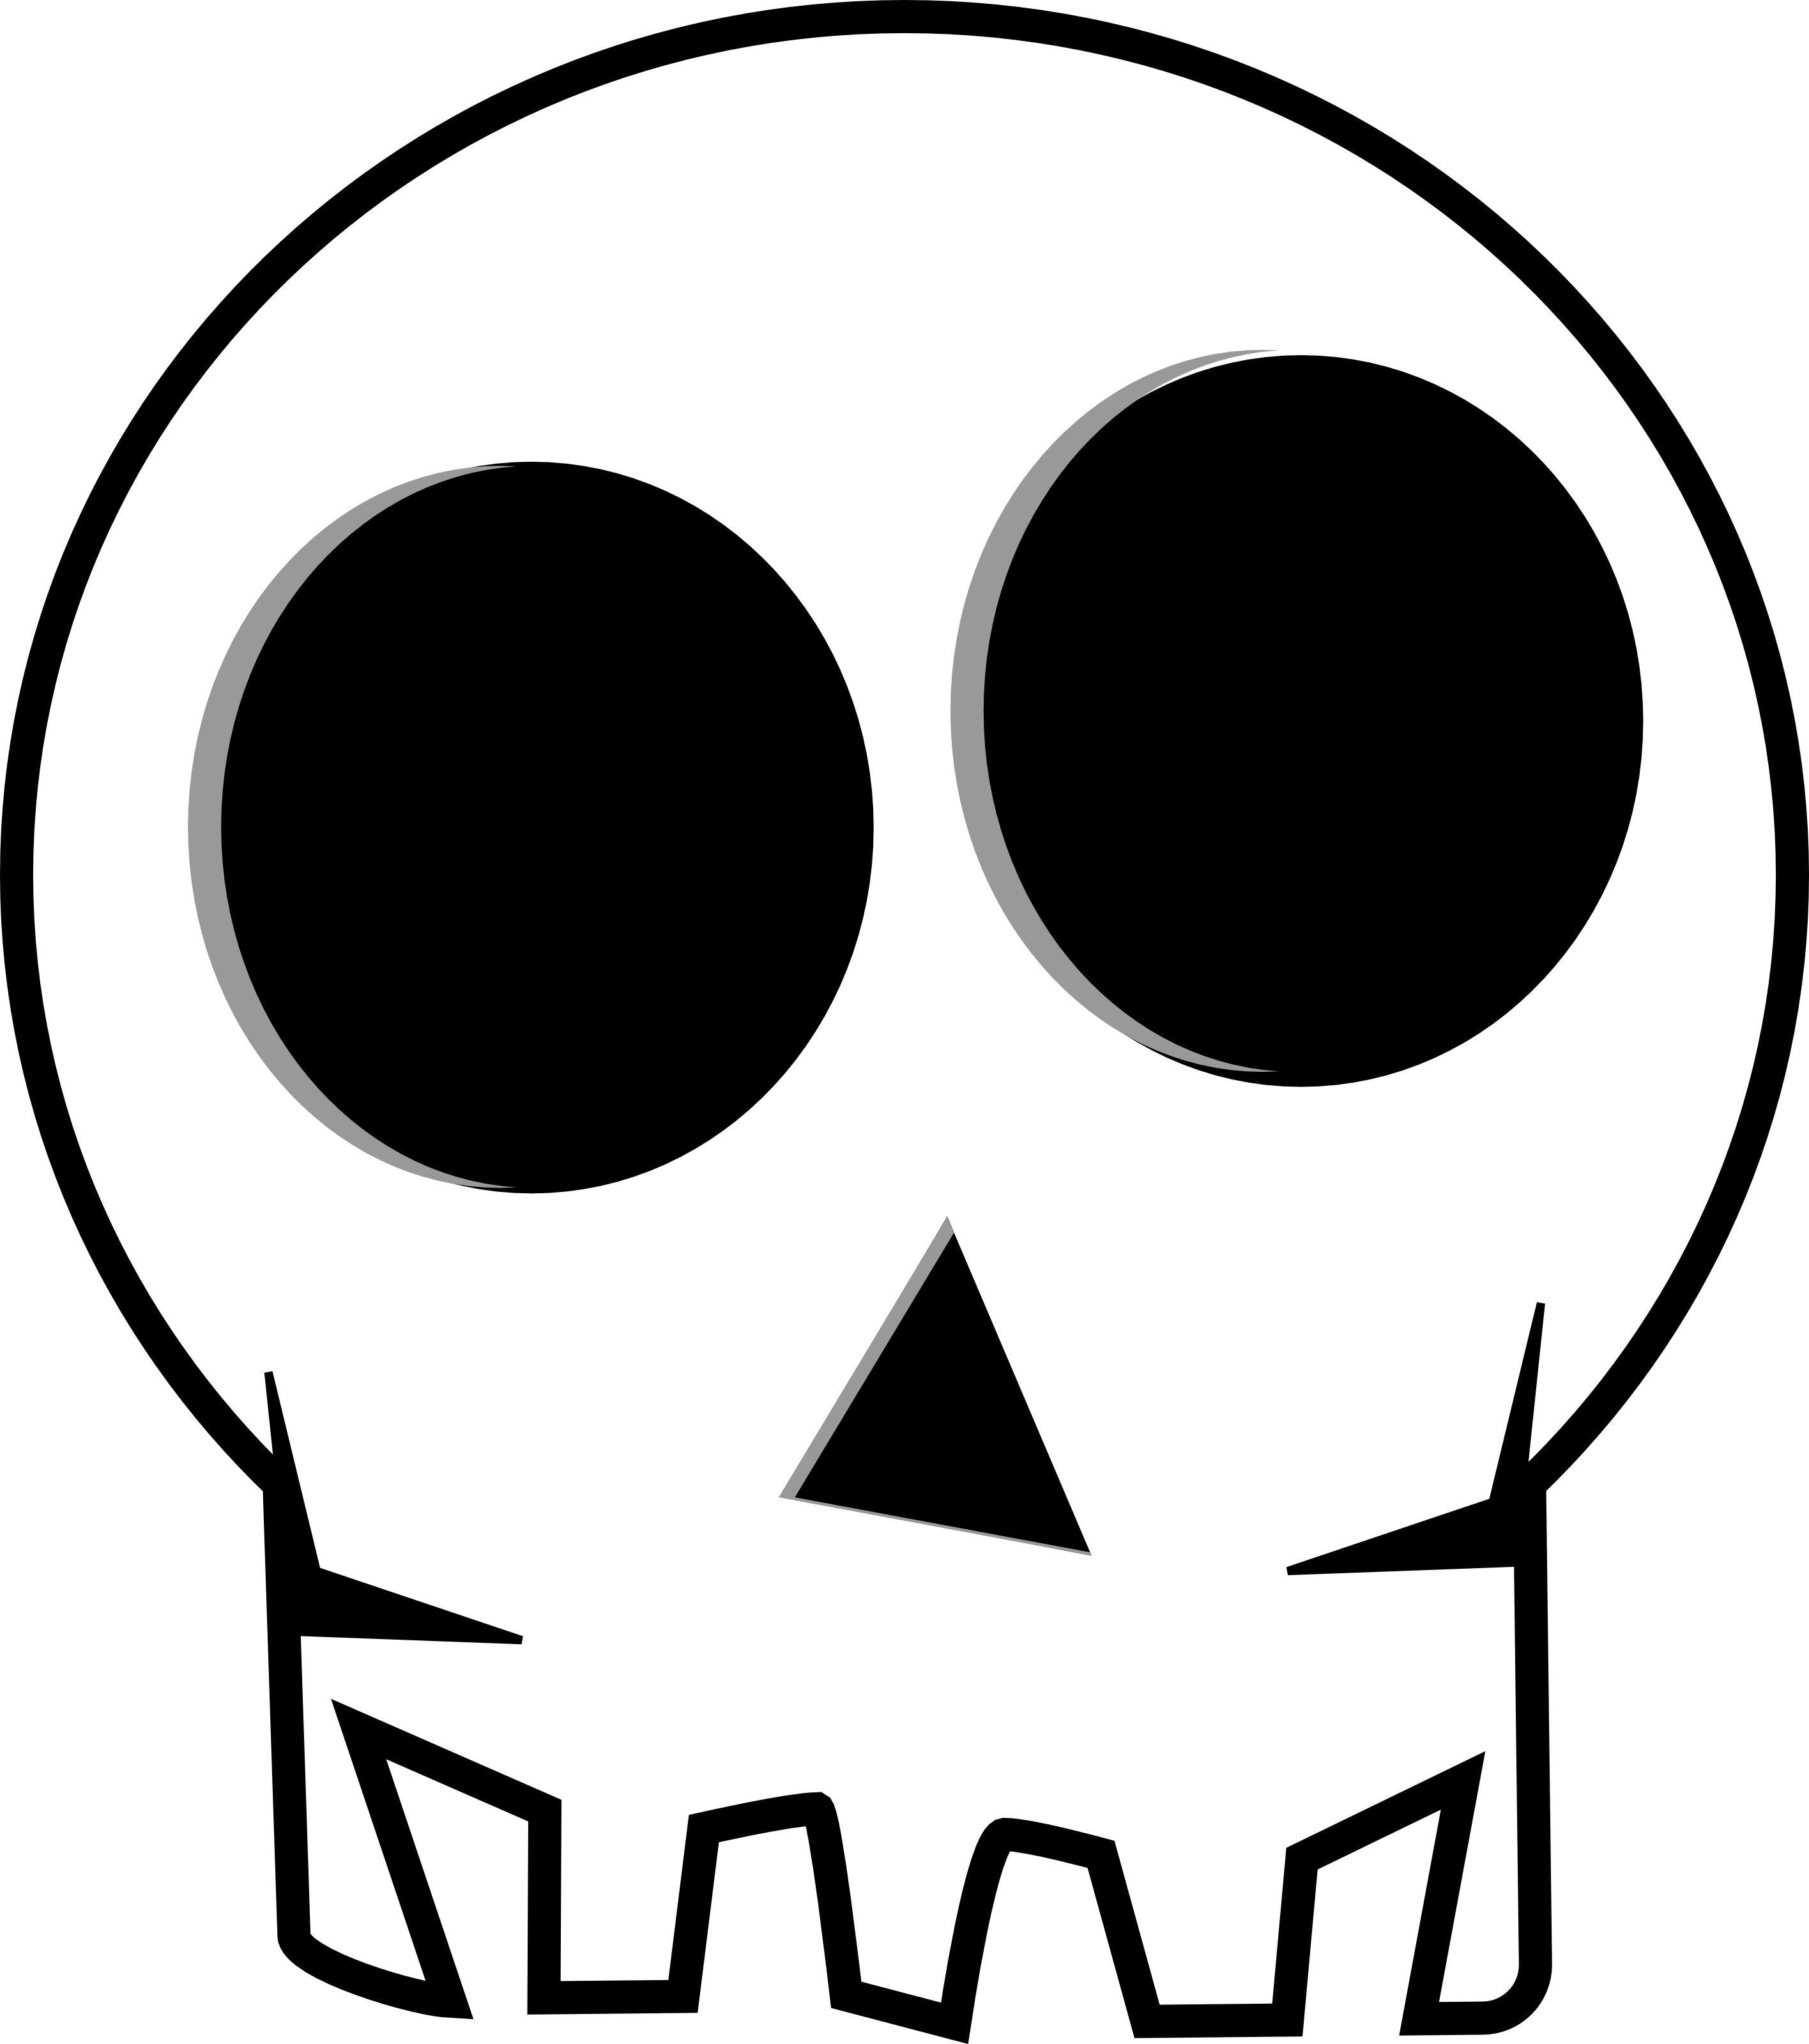 huge eye socketed skull free halloween vector clipart illustration rh pinterest com halloween vectors free halloween vector art